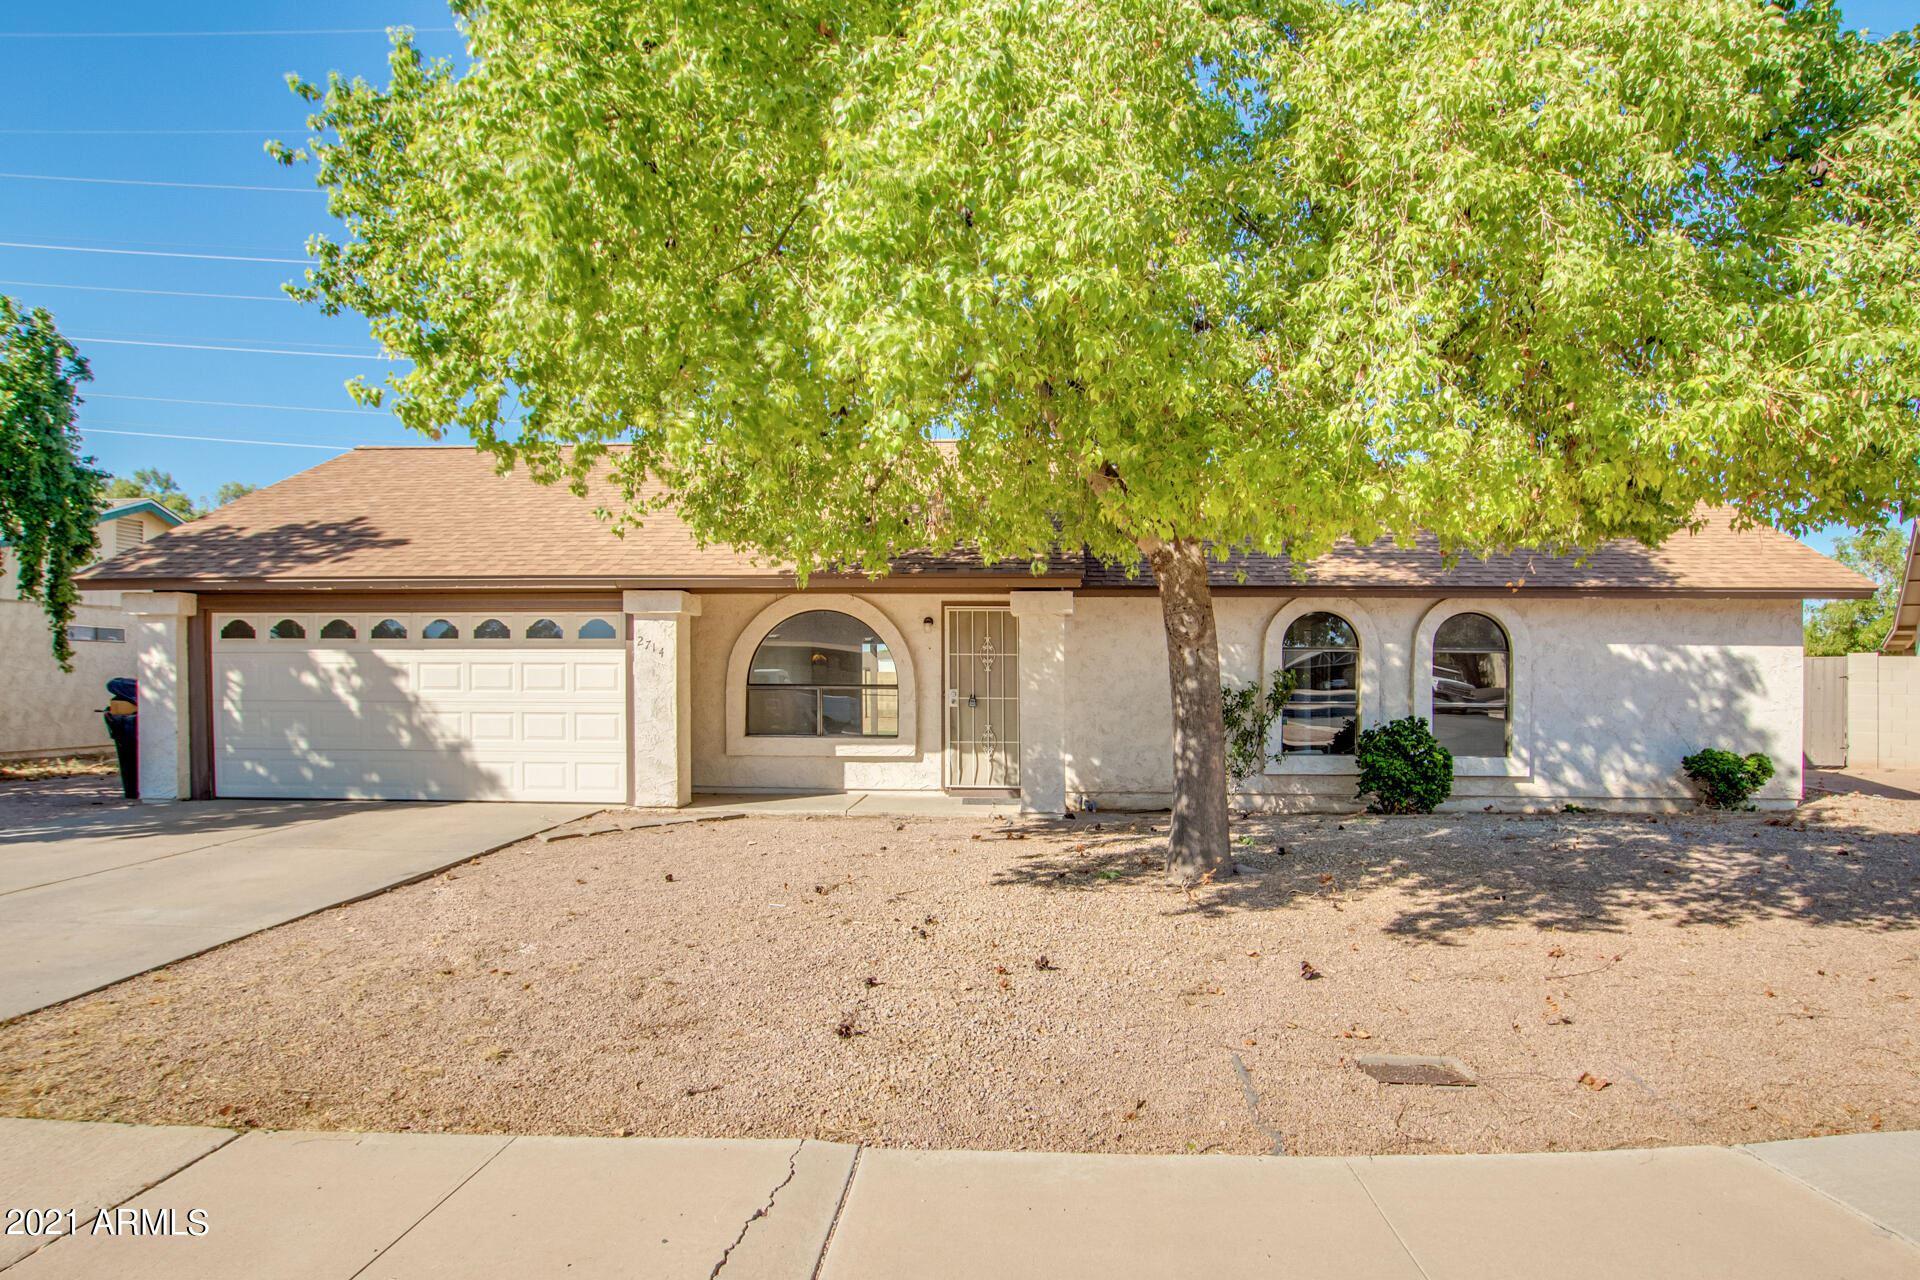 Photo of 2714 E COVINA Street, Mesa, AZ 85213 (MLS # 6307817)